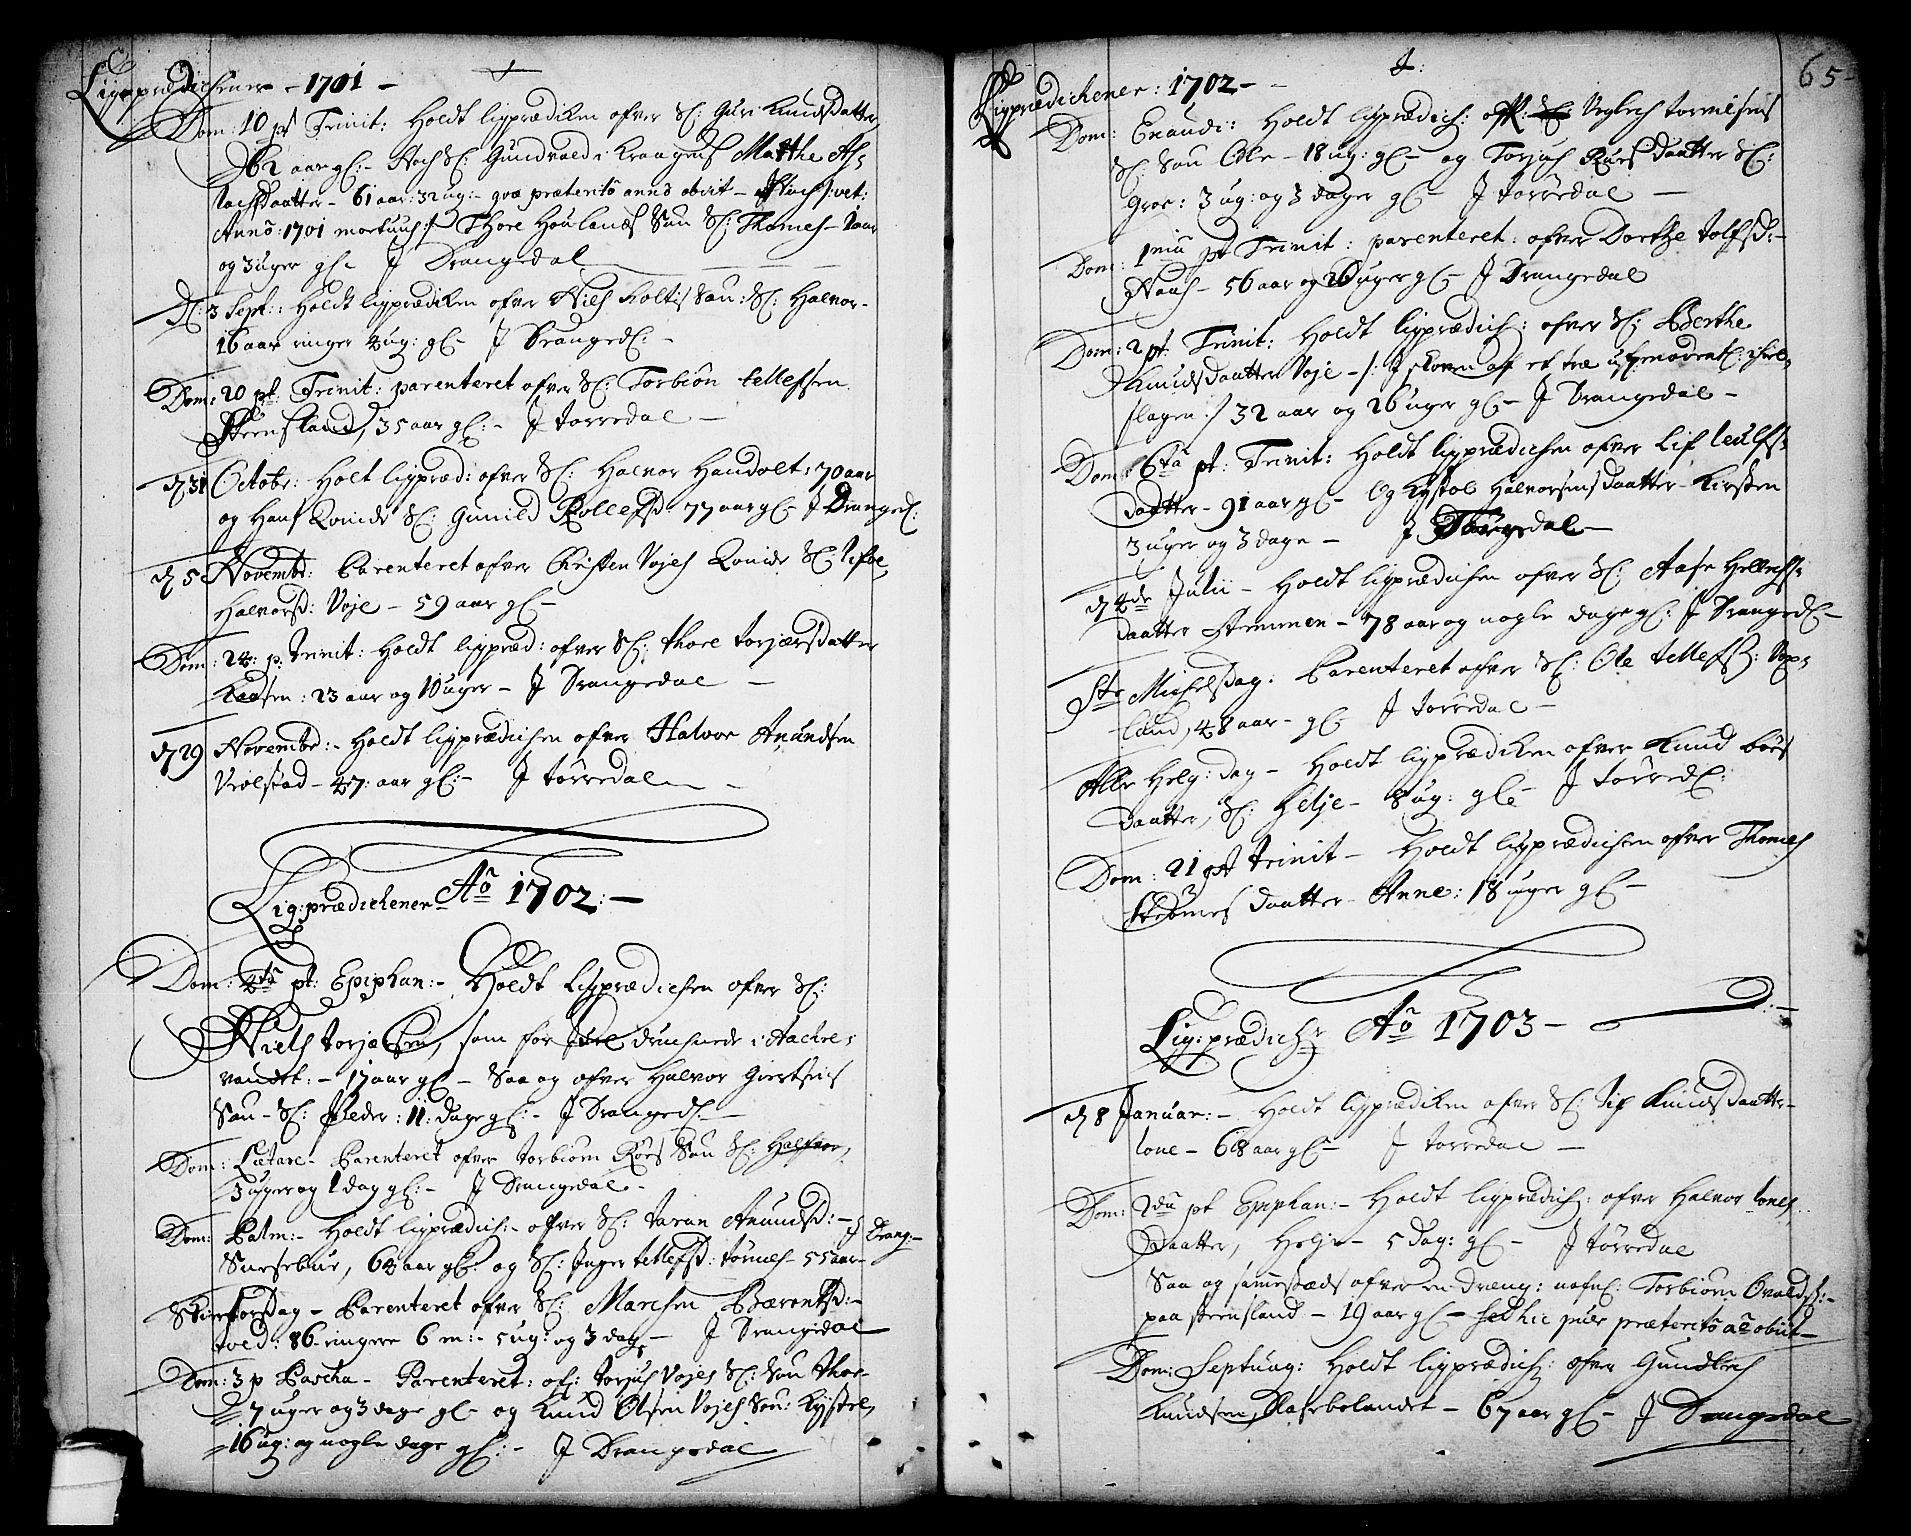 SAKO, Drangedal kirkebøker, F/Fa/L0001: Ministerialbok nr. 1, 1697-1767, s. 65